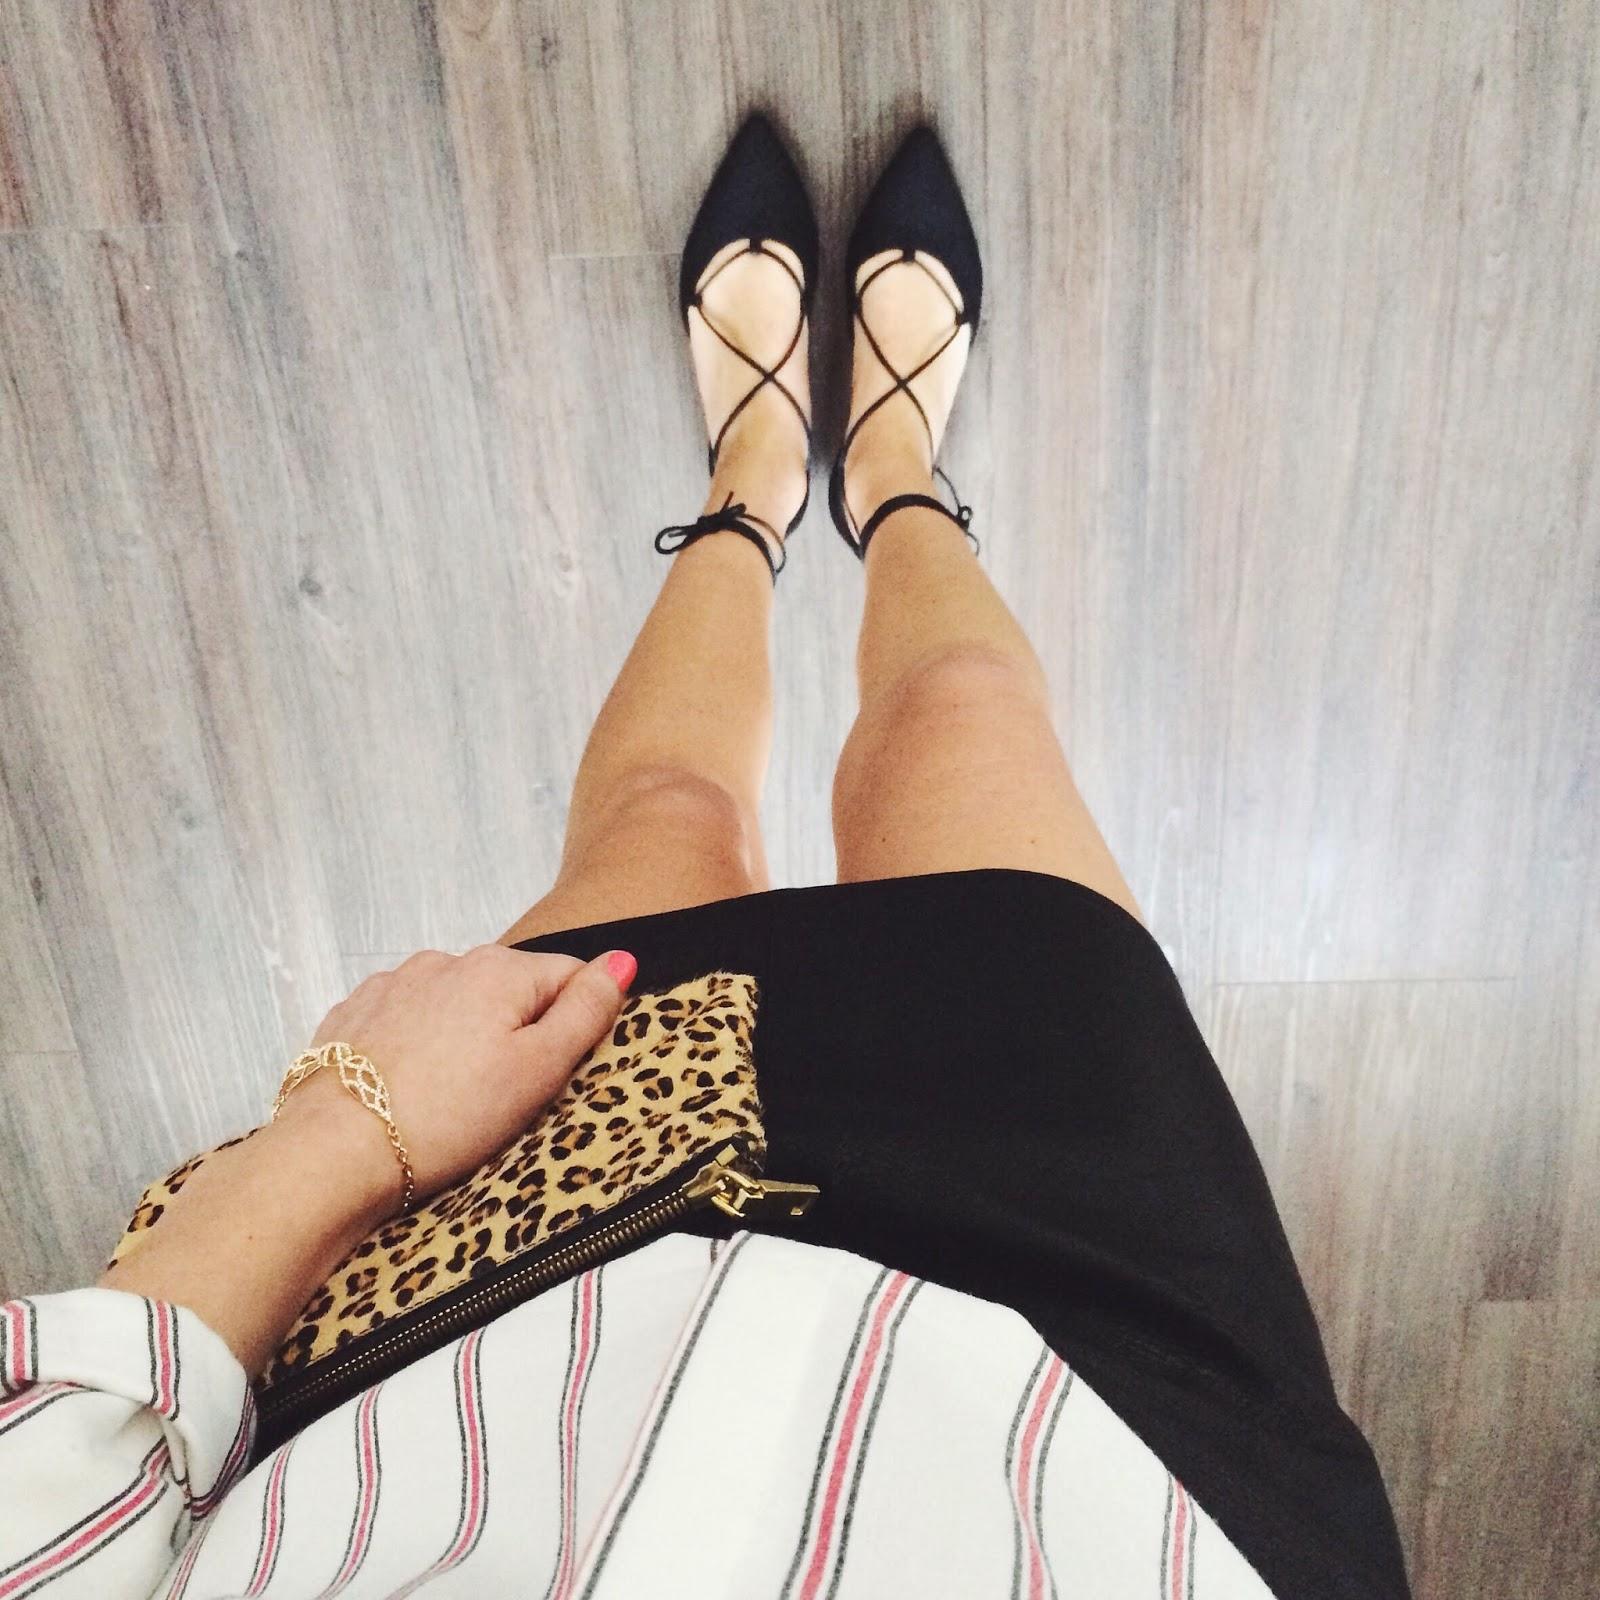 lace up flats, stuart weitzman shoes, stuart weitzman ballet flats, leather skirt, pinstriped shirt, carolina creba